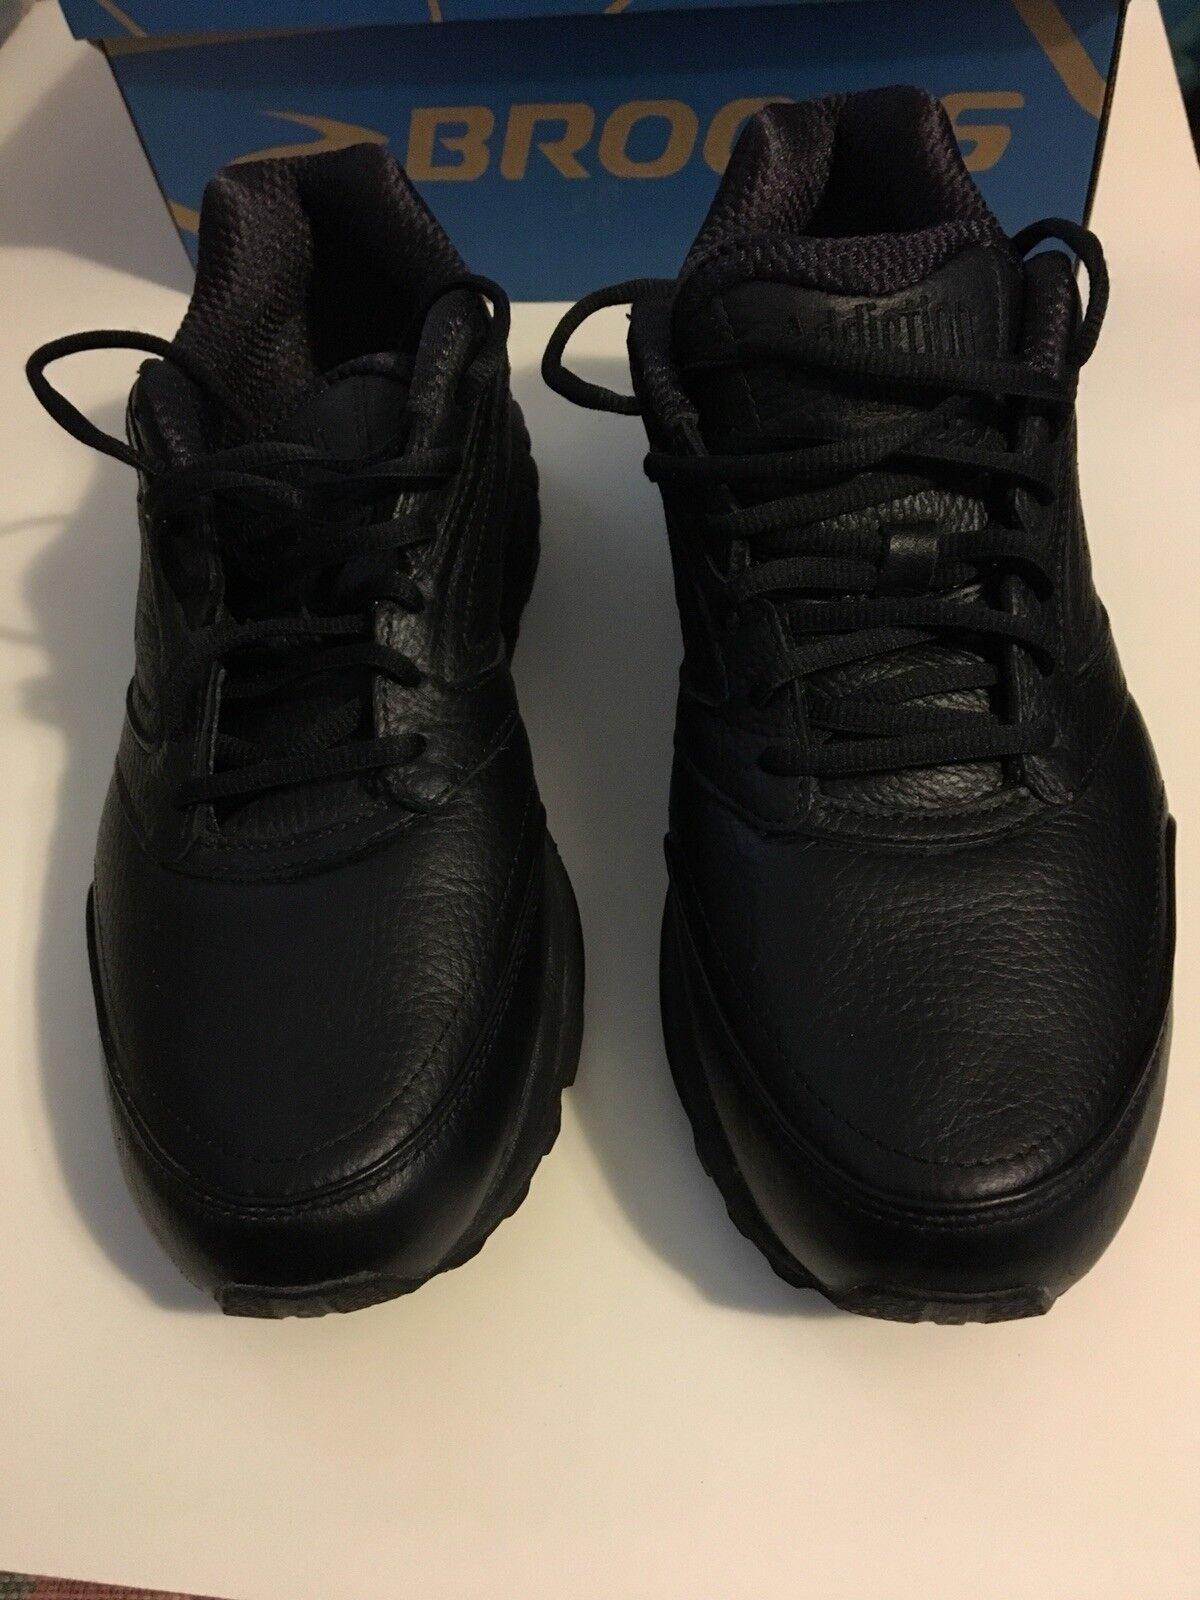 9517b1f67e0 BROOKS Men s Addiction Walker Black Walking shoes Size Size Size 10.5 D  Medium 7dd5cc